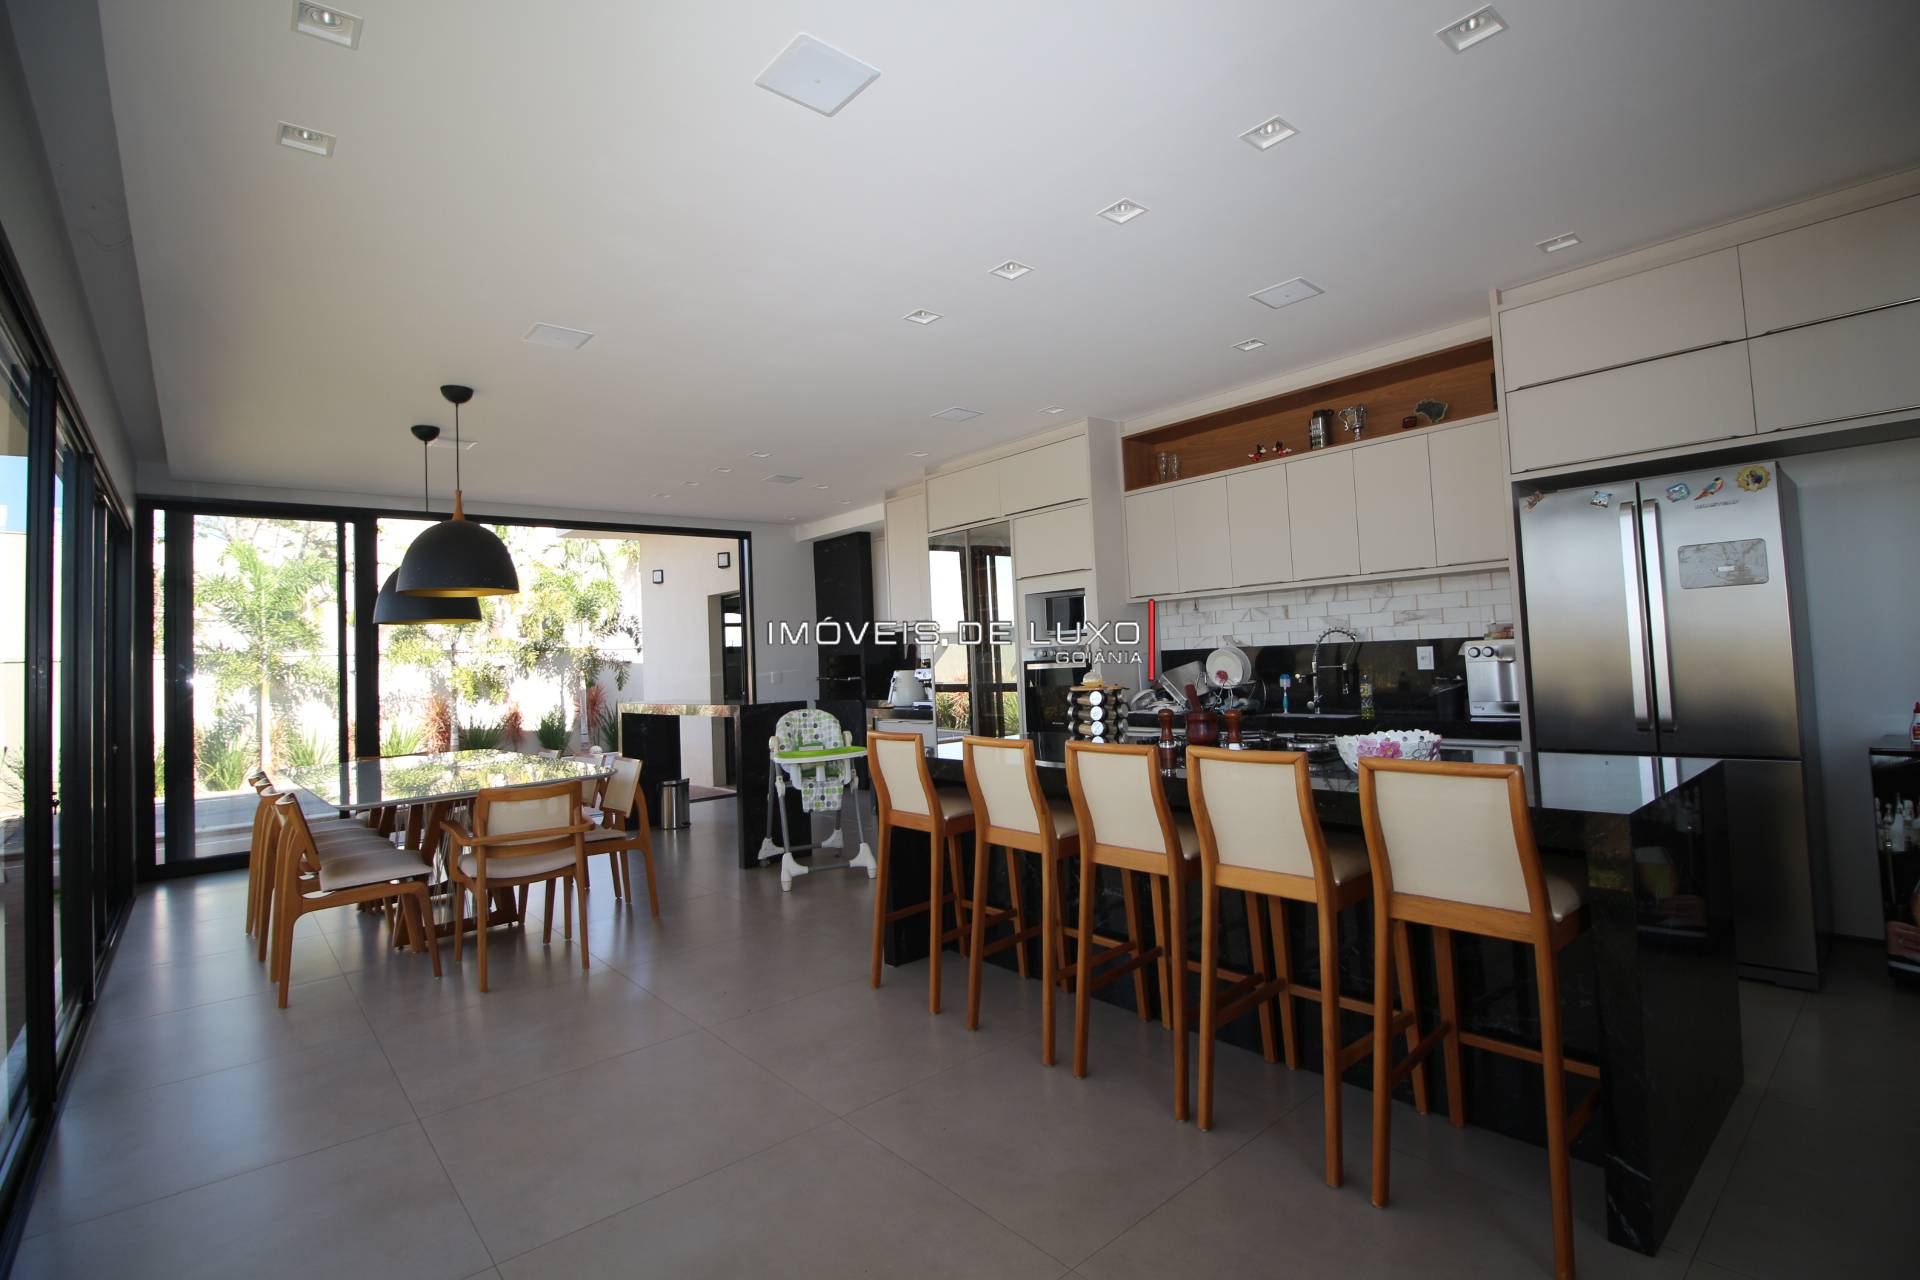 Imóveis de Luxo - Casa Térrea no condomínio do Lago